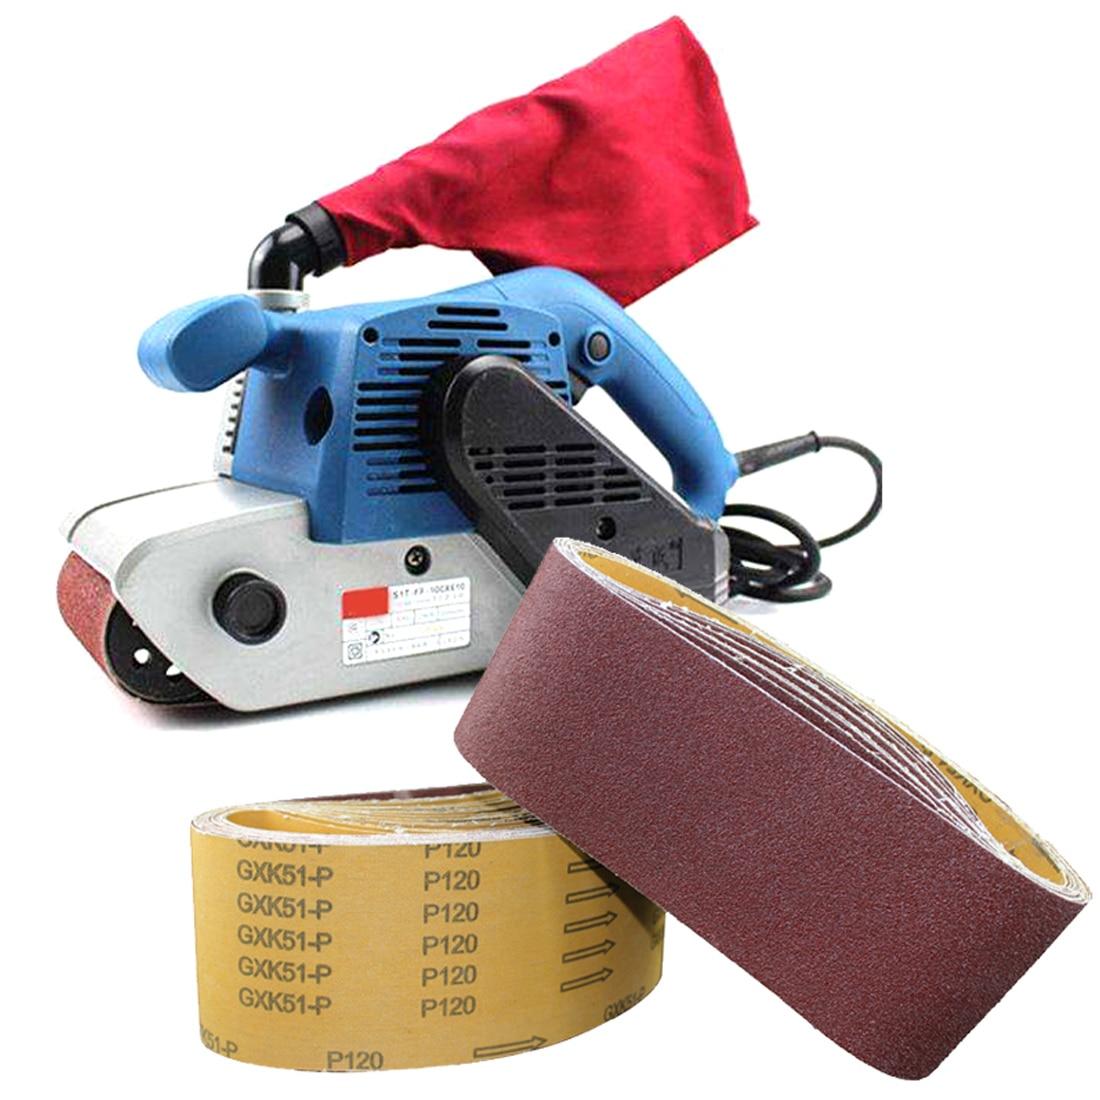 Sander Grinder Belt For Drill Grinding Polishing Power Tool Accessories  Sanding Belt